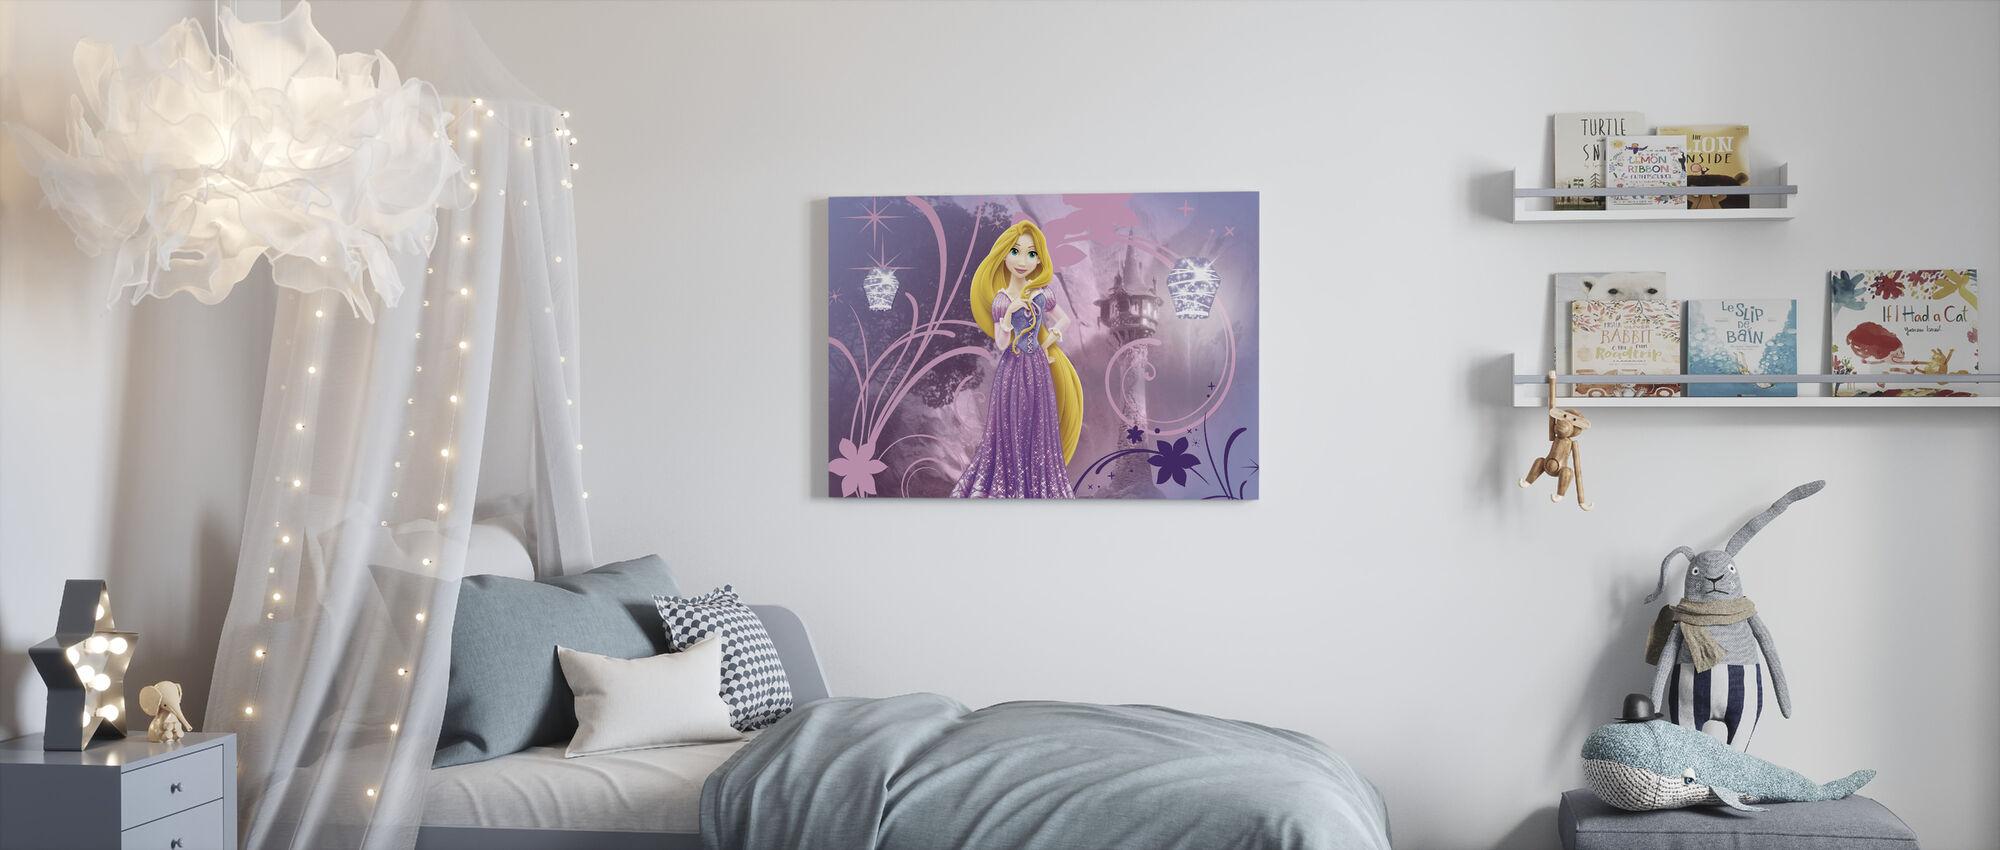 Disney Princess - Rapunzel - Canvastaulu - Lastenhuone